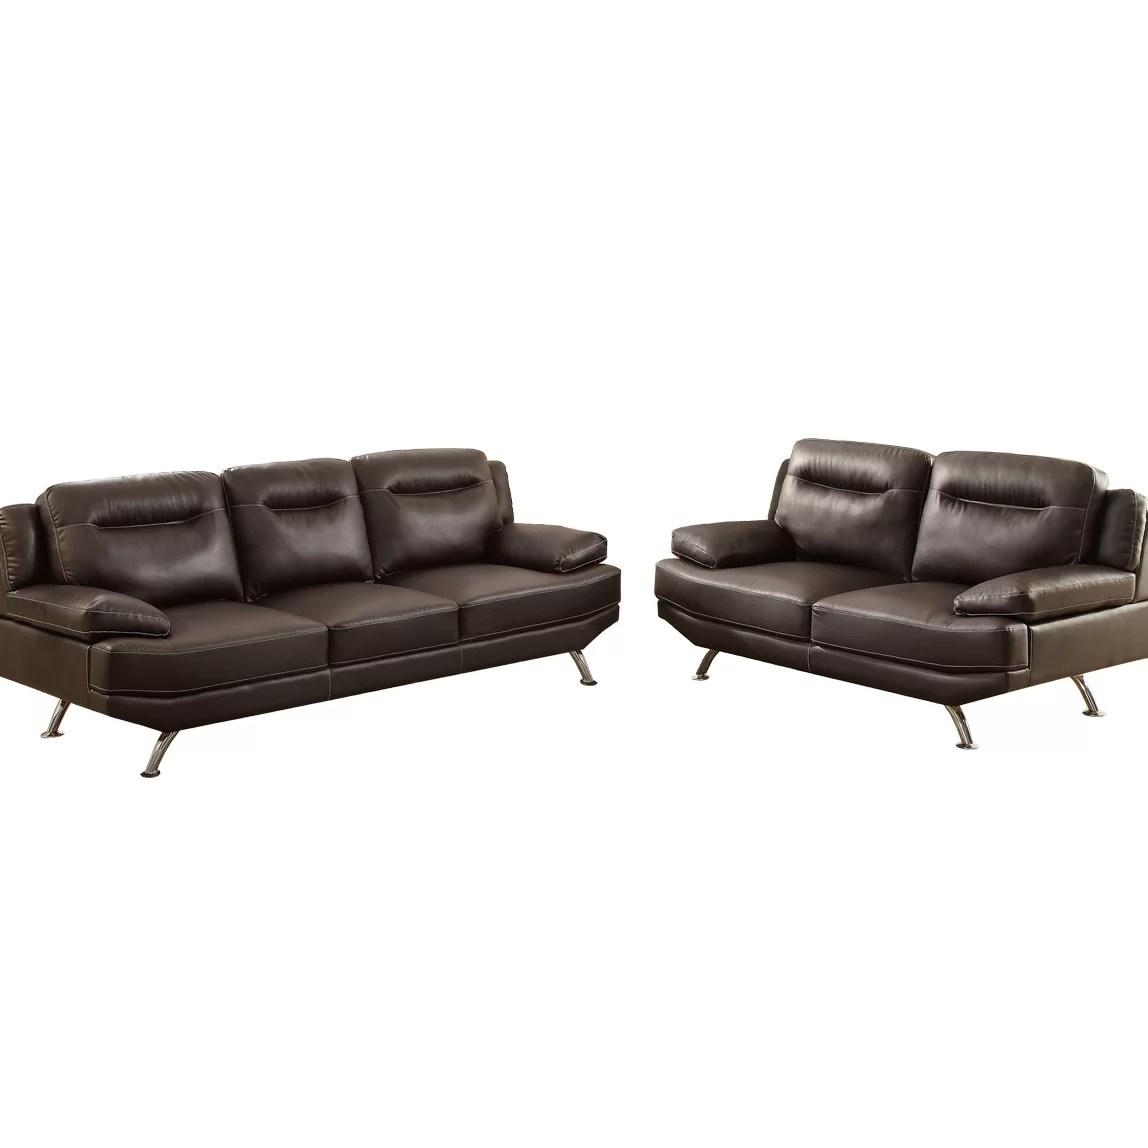 bobkona sectional sofa embly instructions craigslist vancouver poundex danville 2 piece and loveseat set